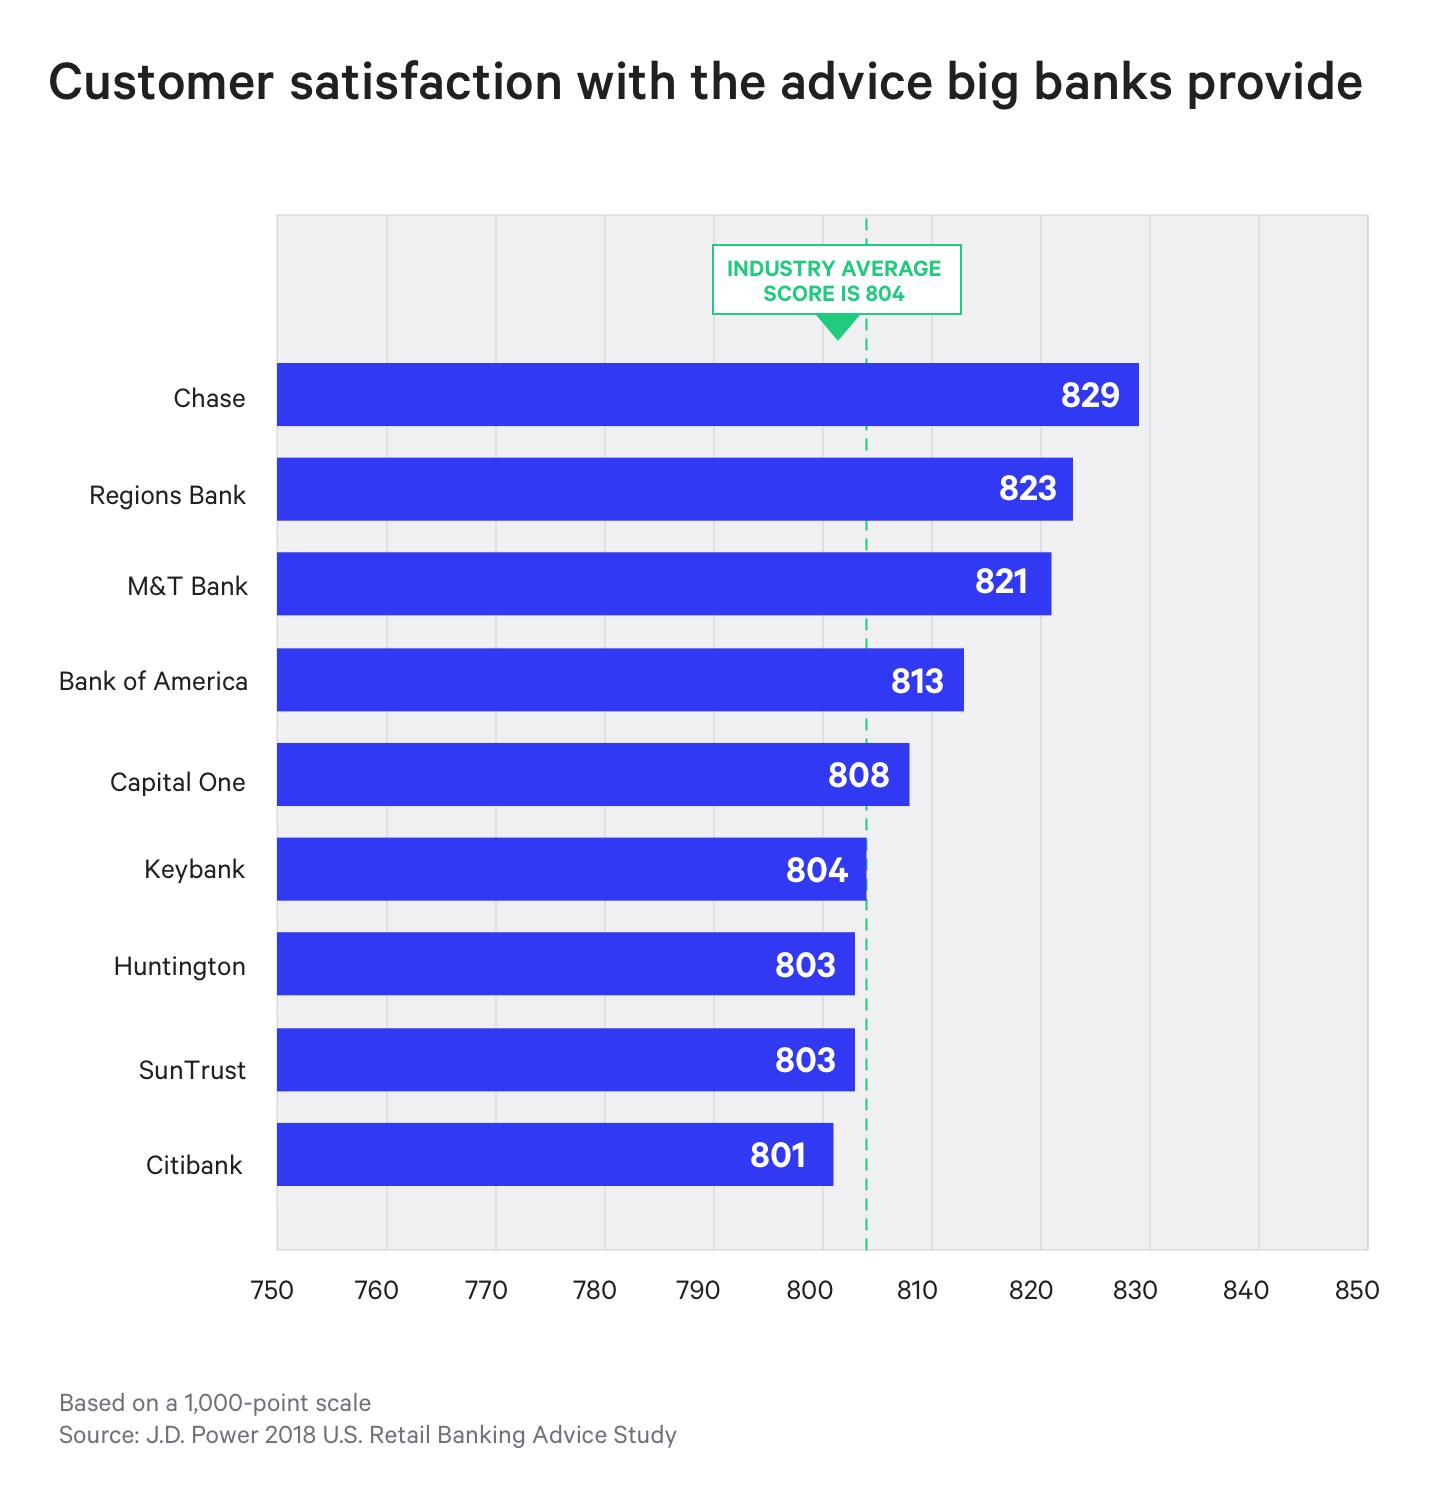 J.D. Power 2018 U.S. Retail Banking Advice Study graph